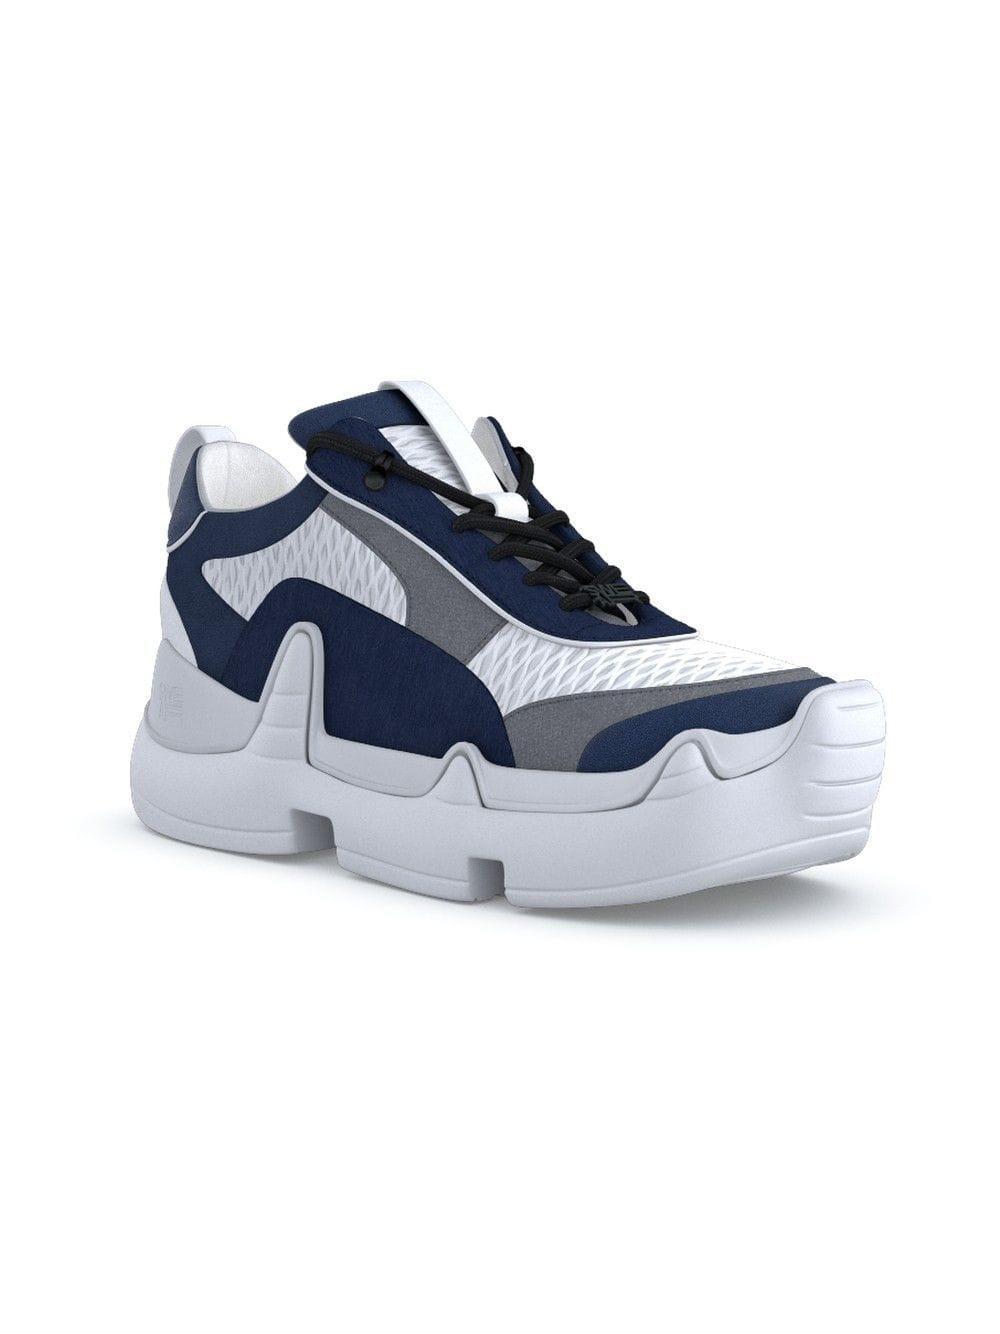 Lyst China X In White Nitro Air Exclusive Swear Farfetch 8OXn0wPk